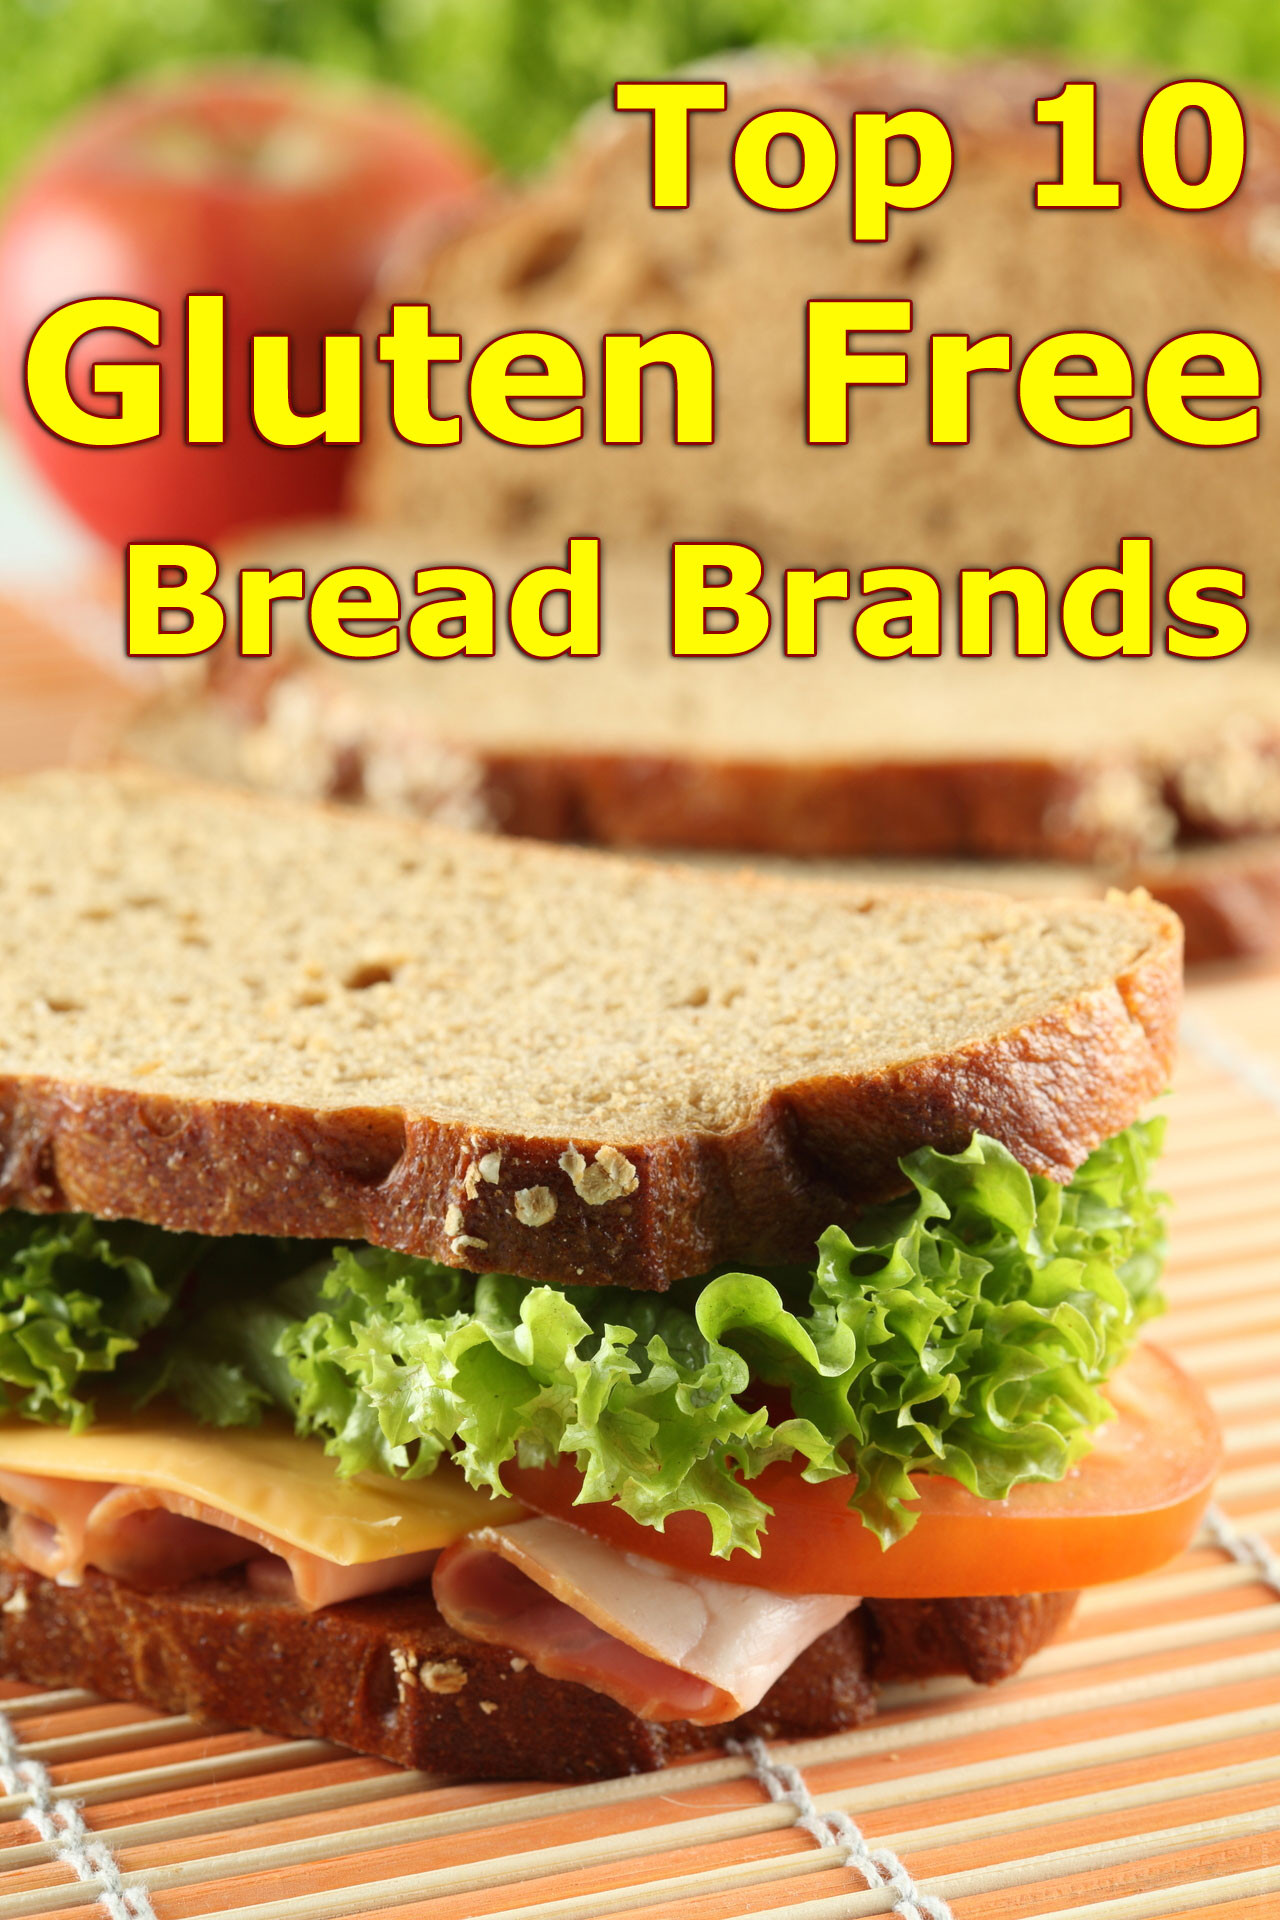 Vegan Gluten Free Bread Brands  Top 10 Gluten Free Bread Brands